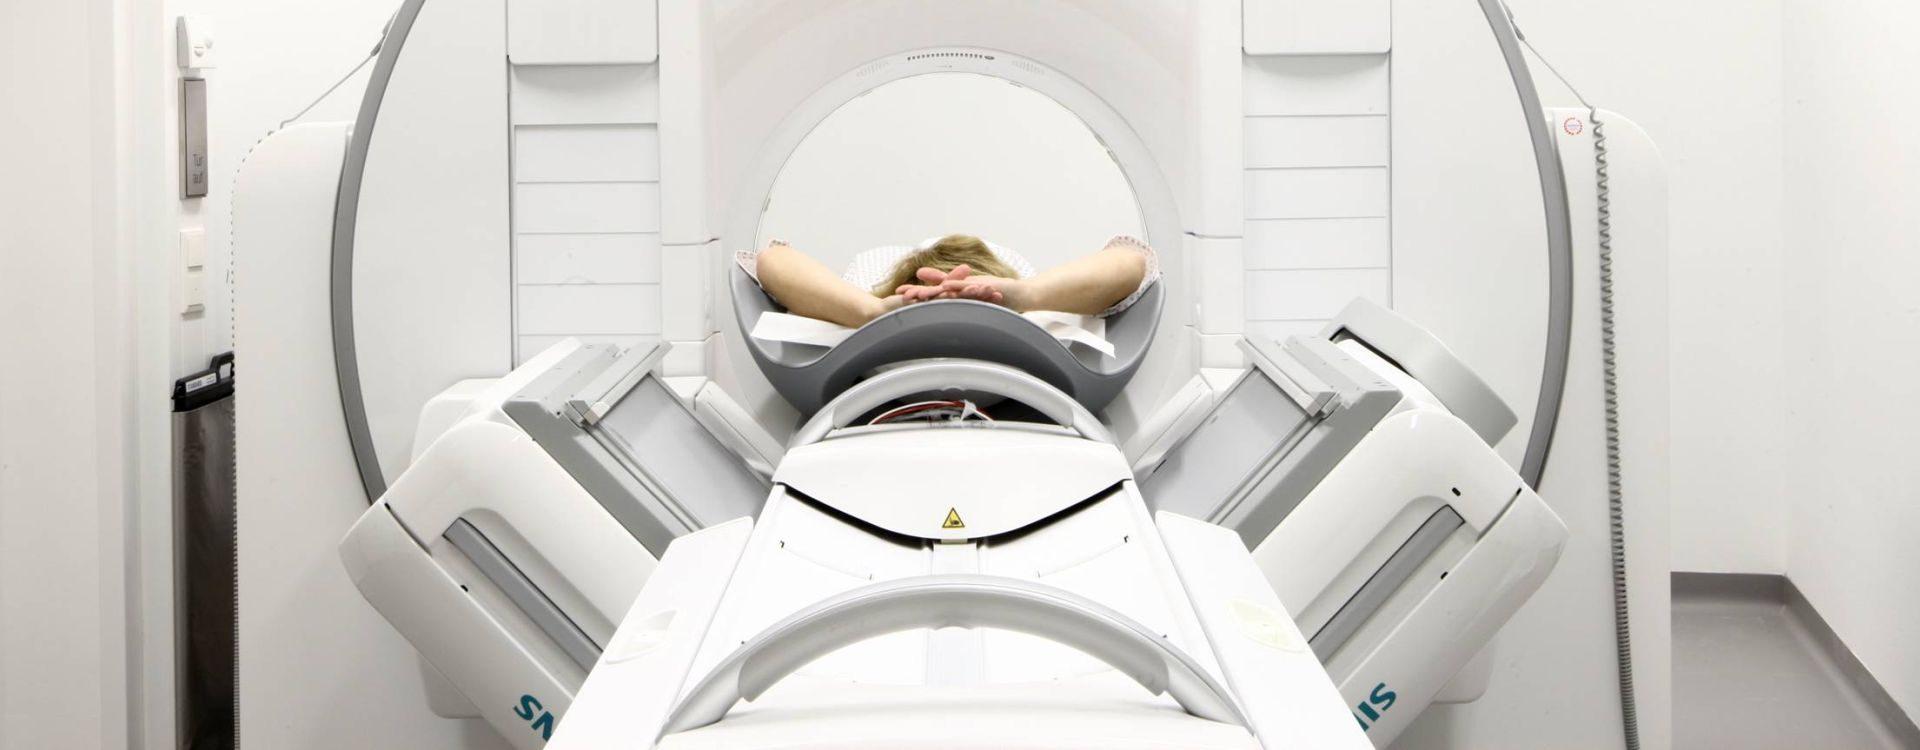 Radiology Center